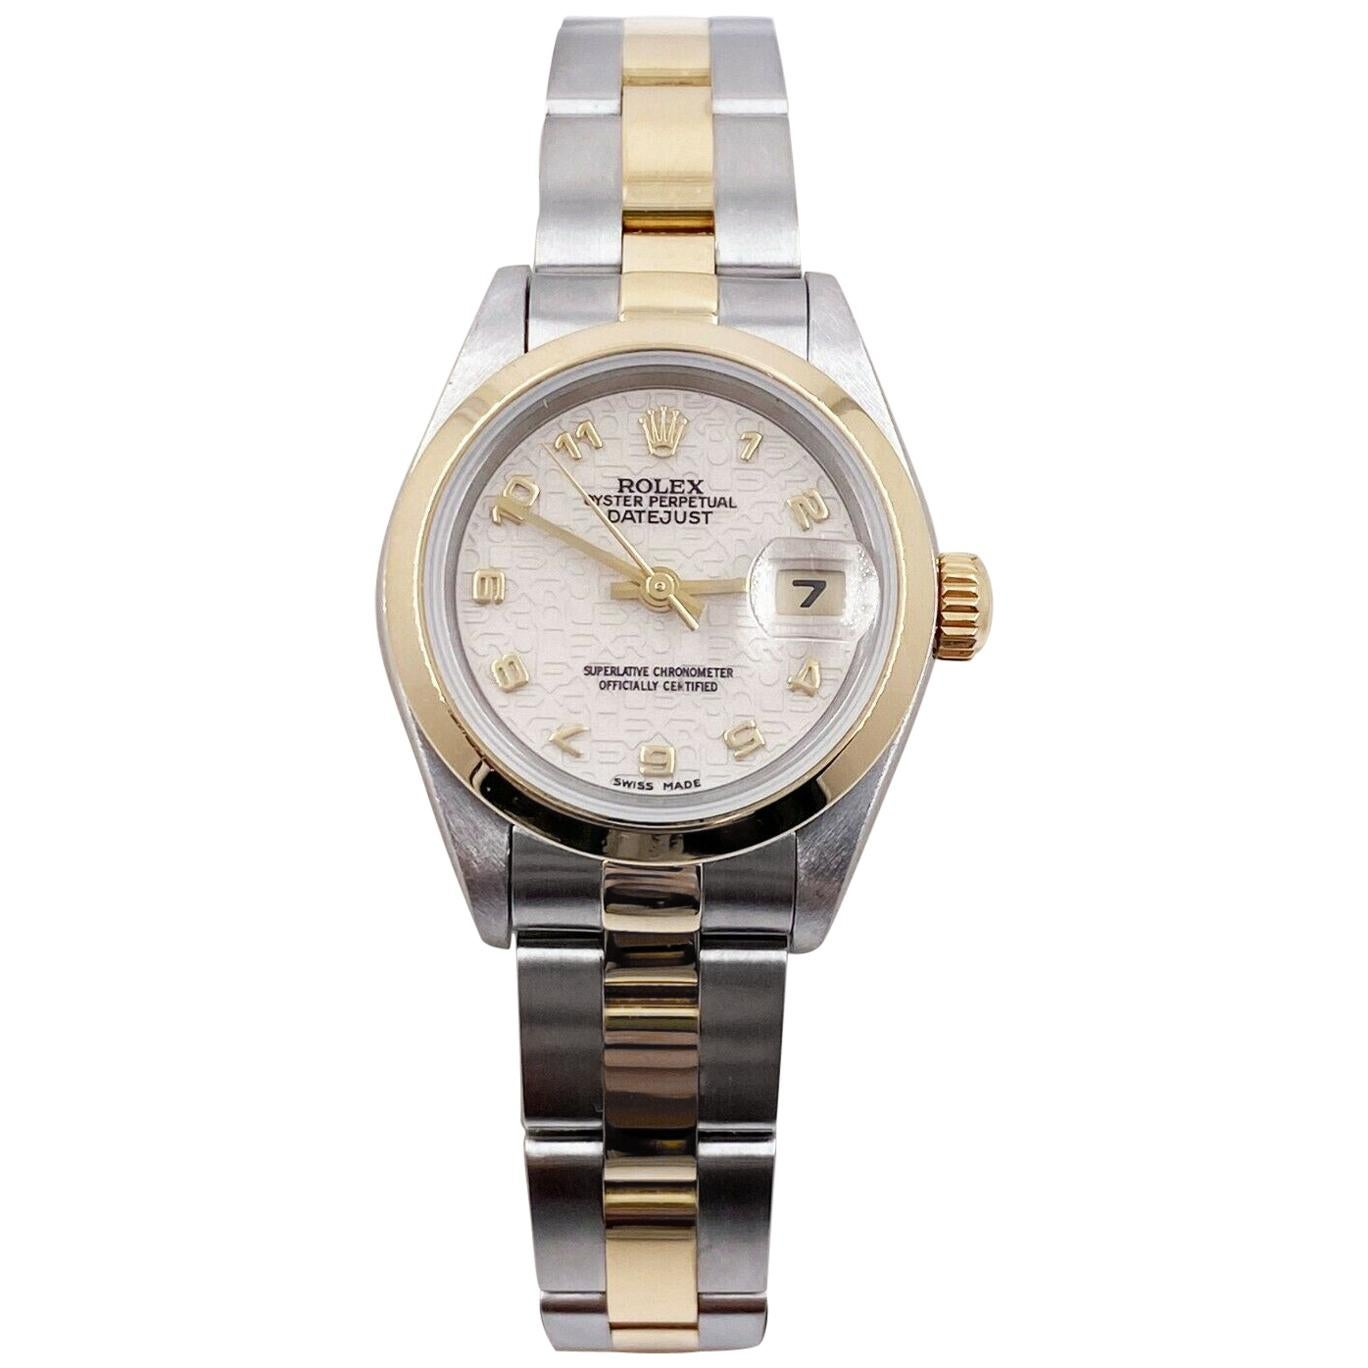 Rolex Ladies Datejust 69163 Jubilee Anniversary Dial 18 Karat Gold Stainless